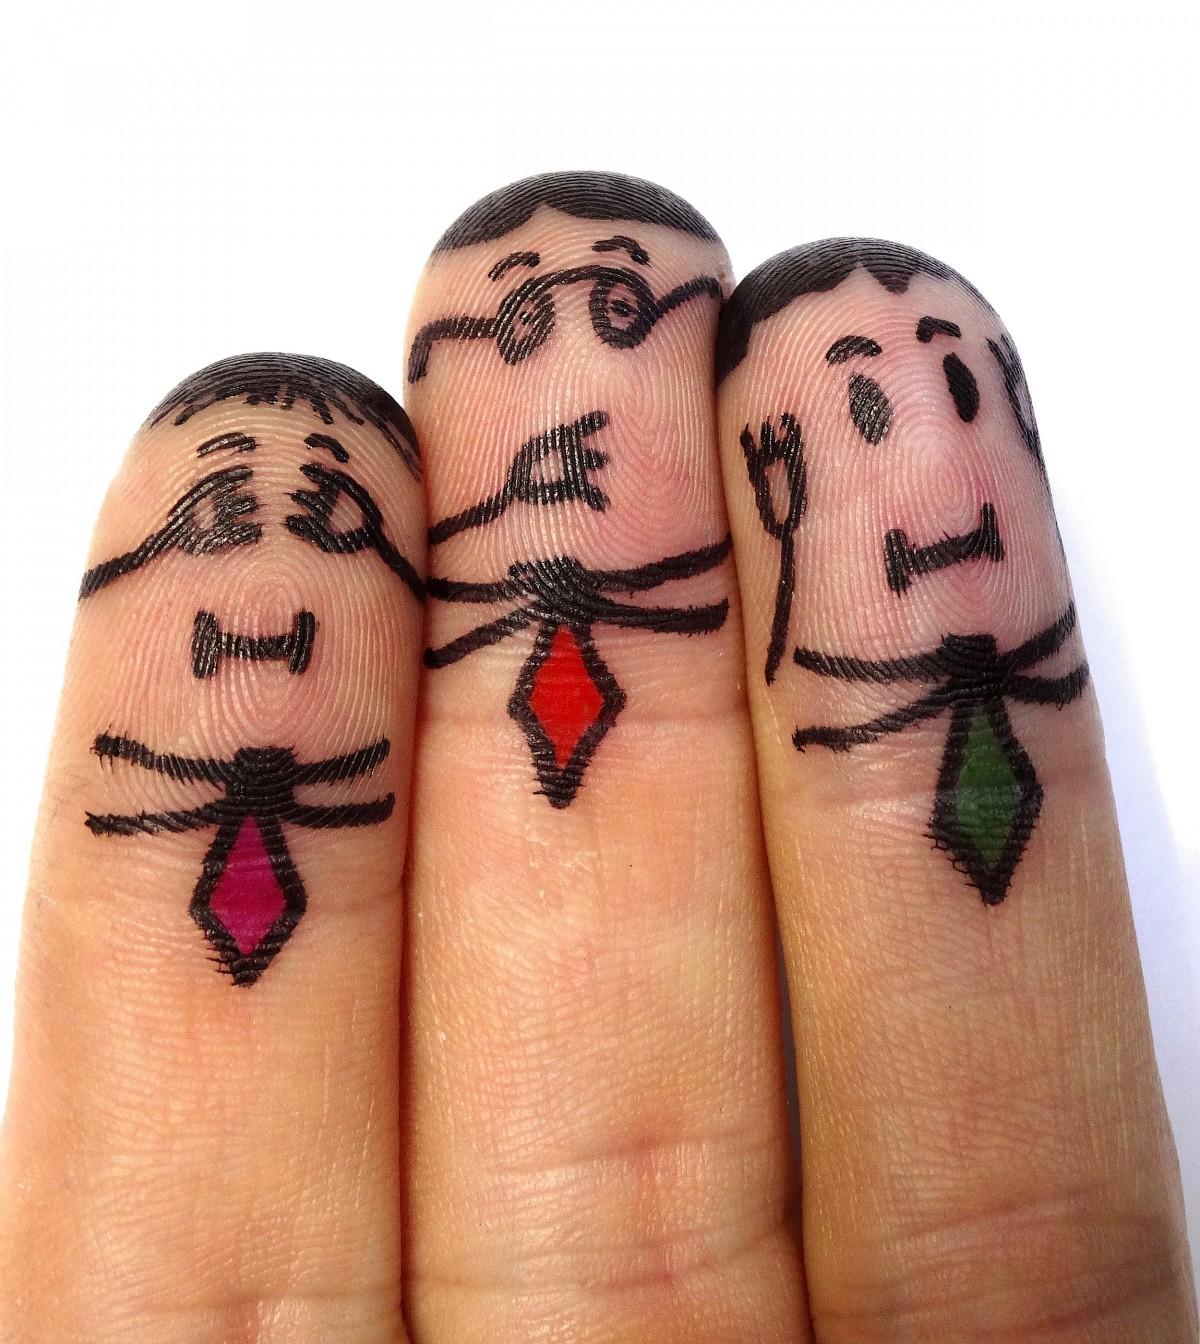 finger_man_not_hear_not_see_don_t_talk_finger_males_person_don_t_listen-935856.jpg